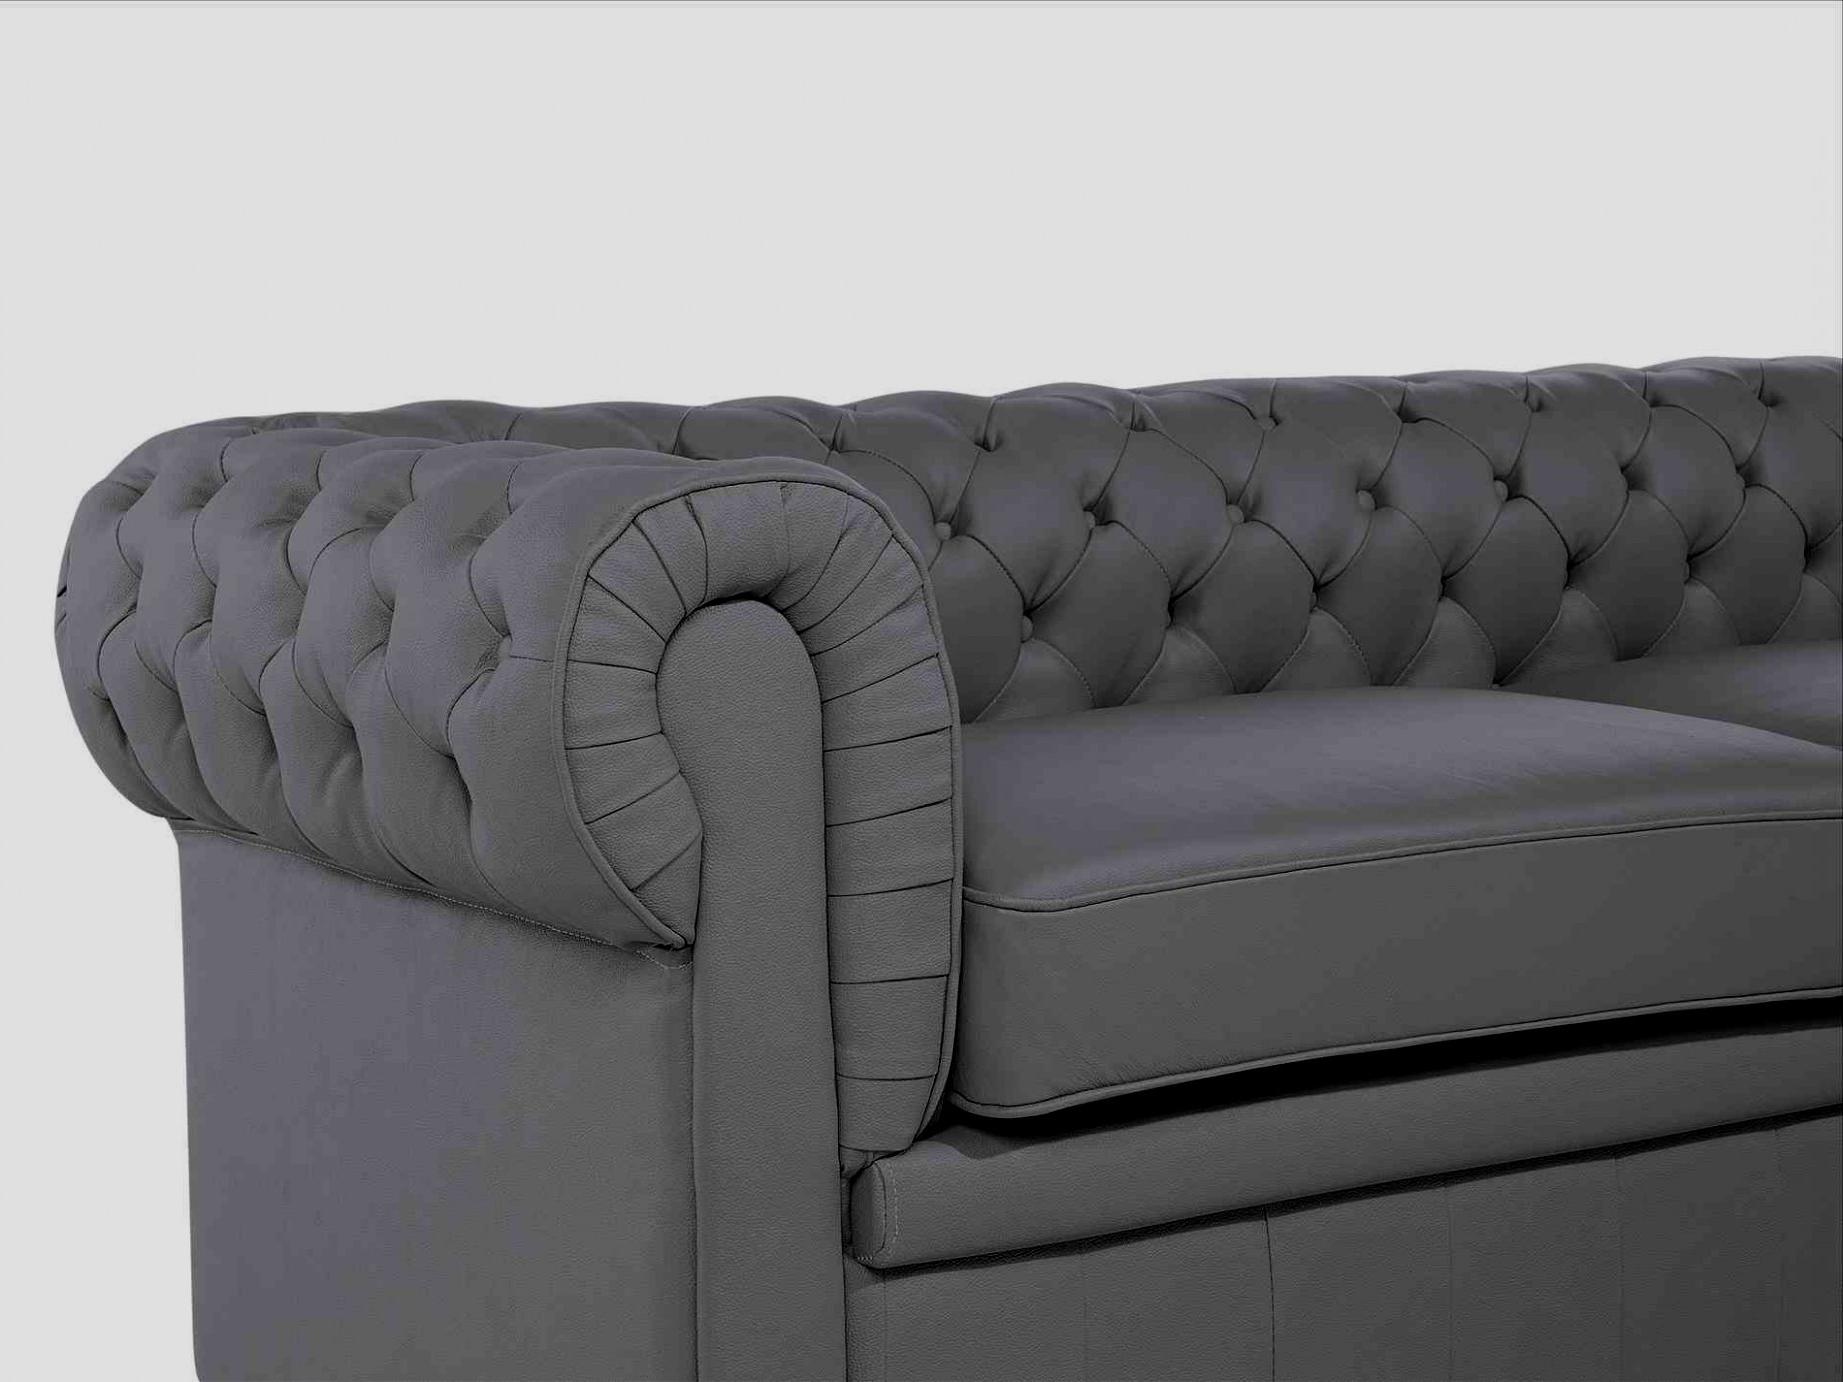 Sofas Modulares Ikea Irdz sofas Rinconeras Modulares Especial Ikea U sofa Busco Sillas